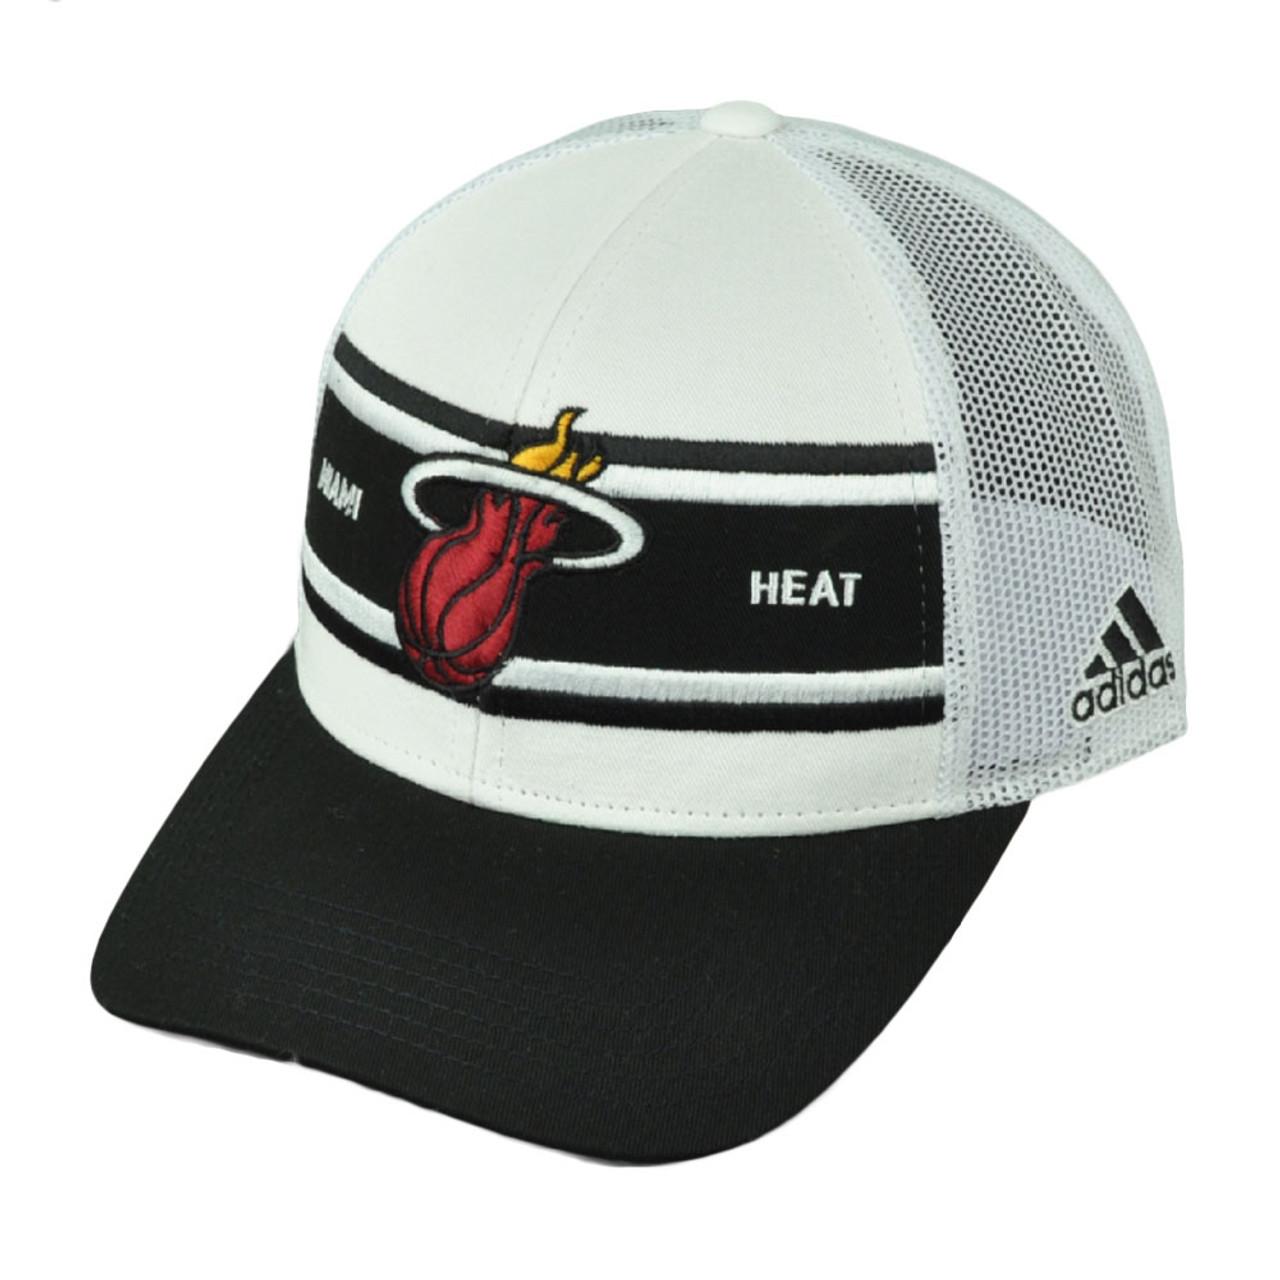 f87a9005cd1 Miami Heat Adidas White Black Mesh Snapback NZM06 Hat Cap Basketball Curved  Bill